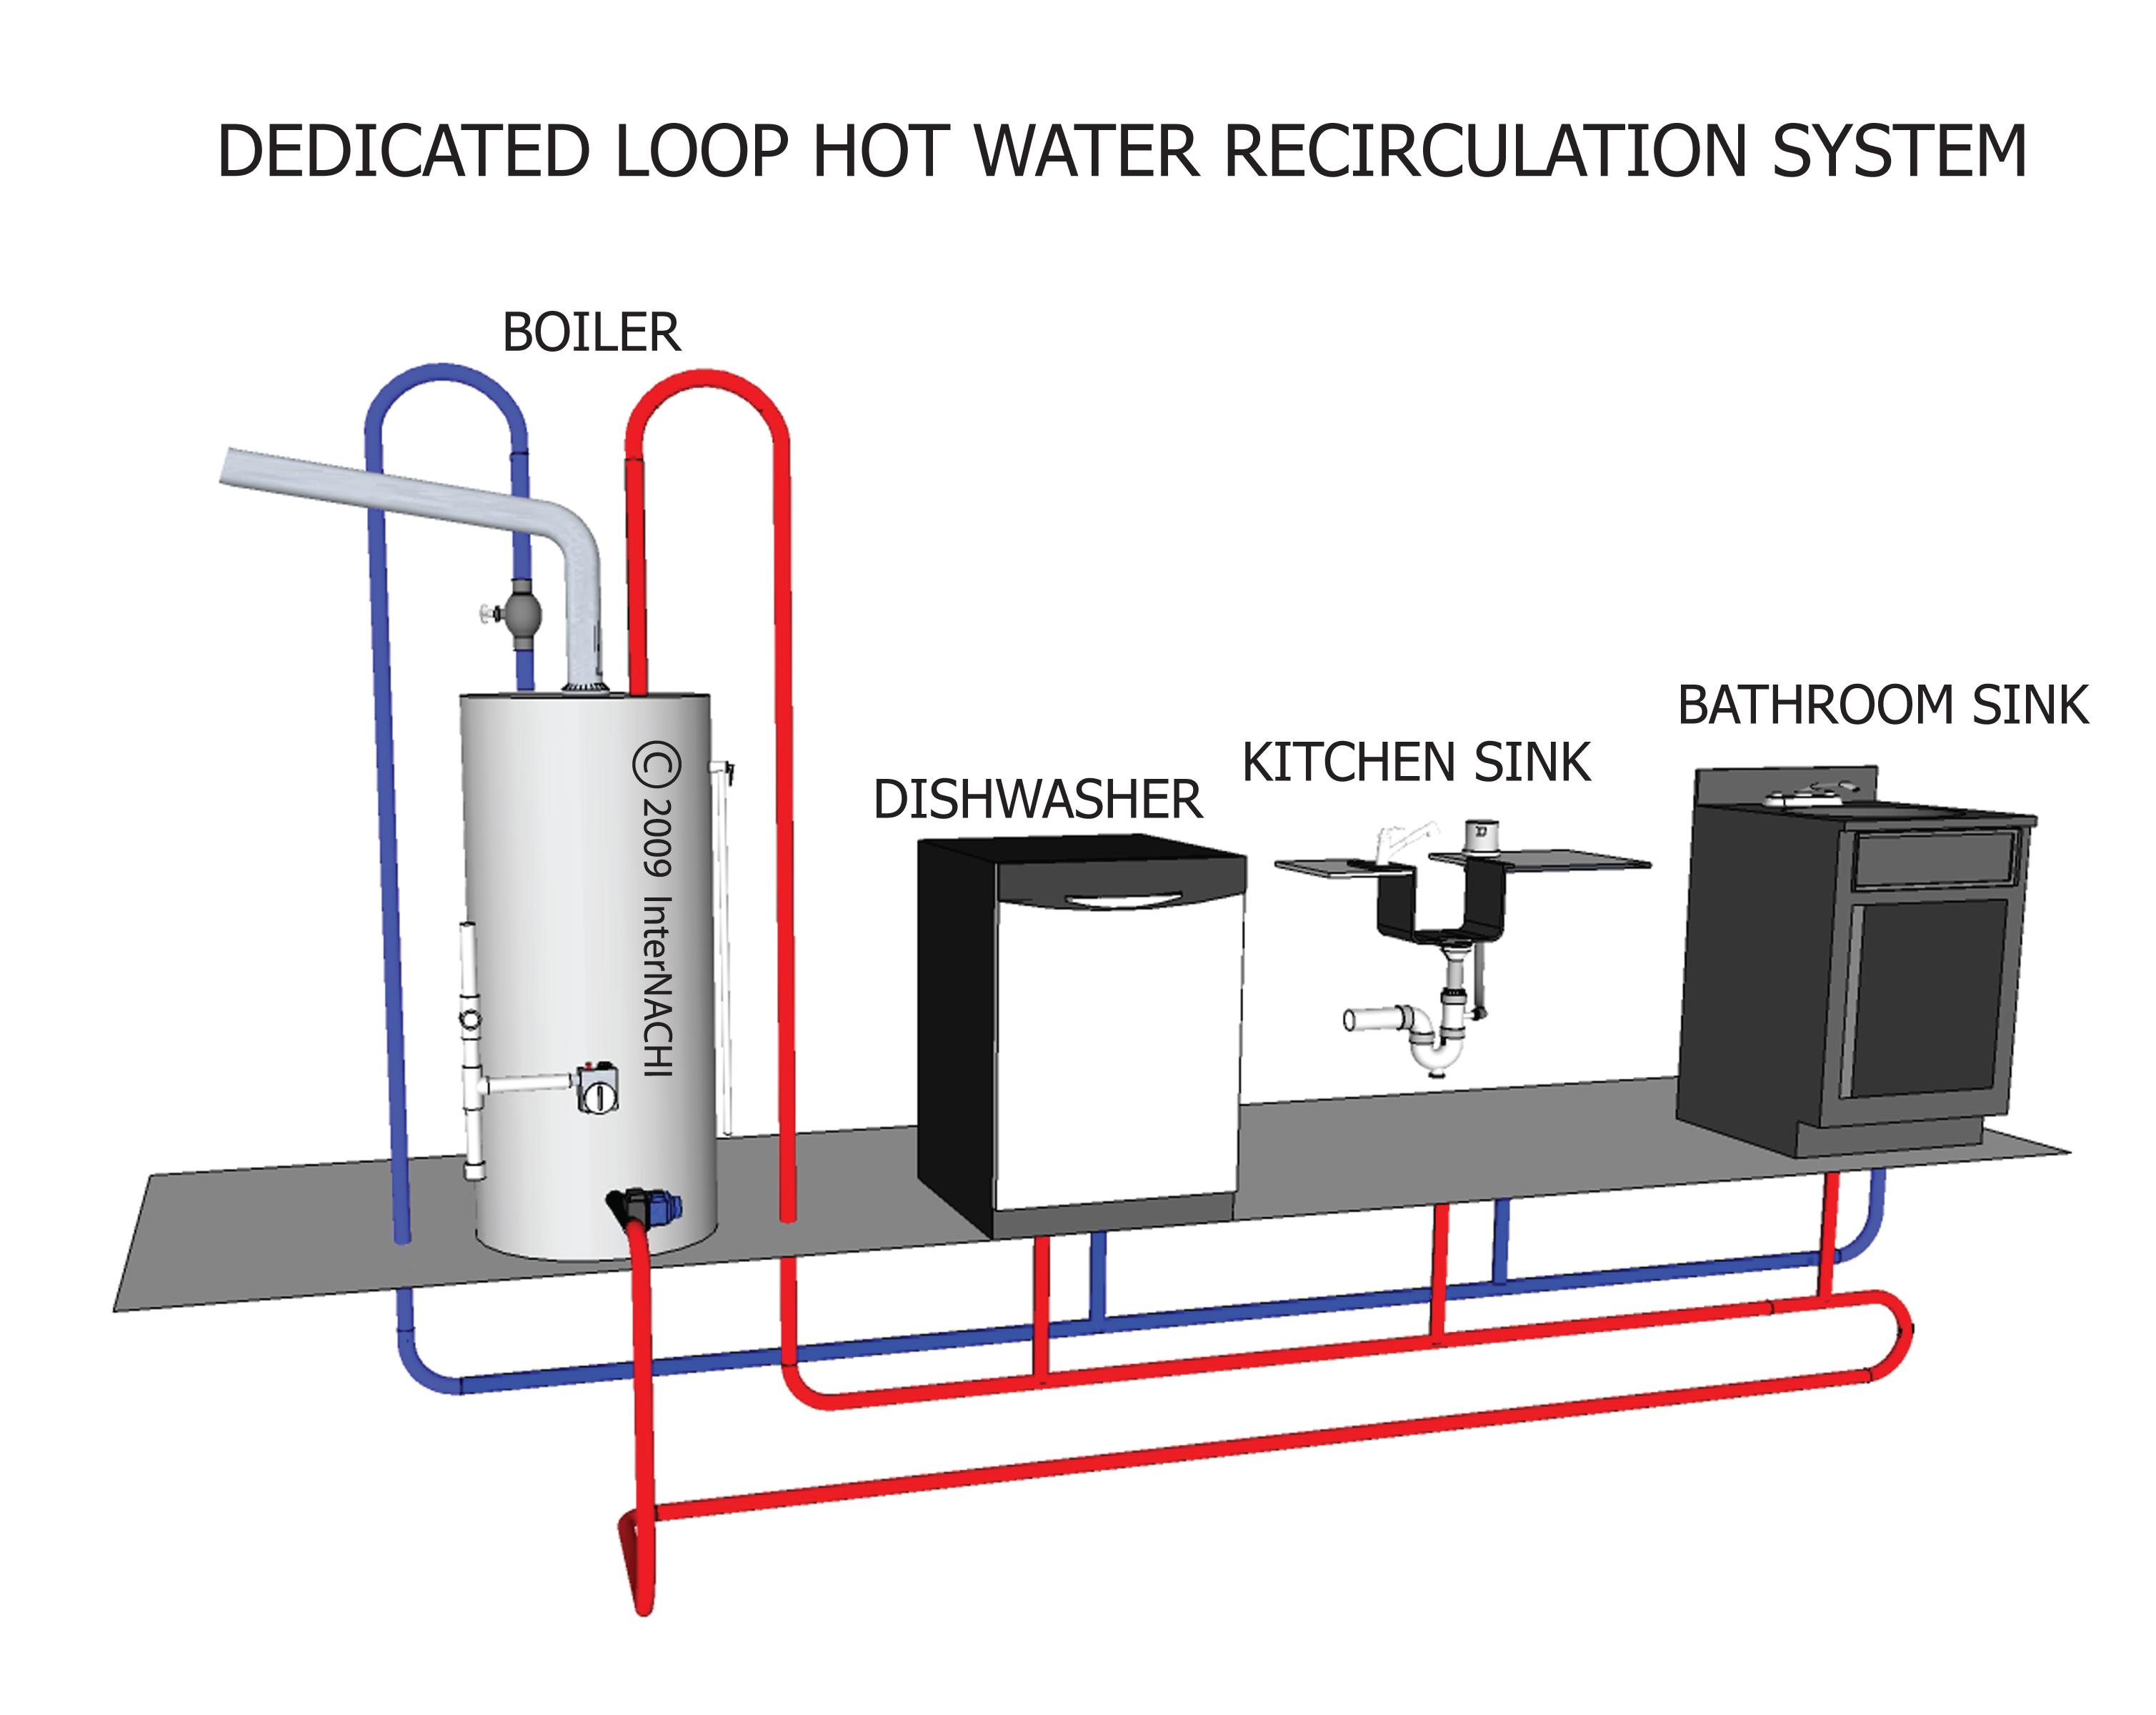 Dedicated loop, hot water recirculation system.